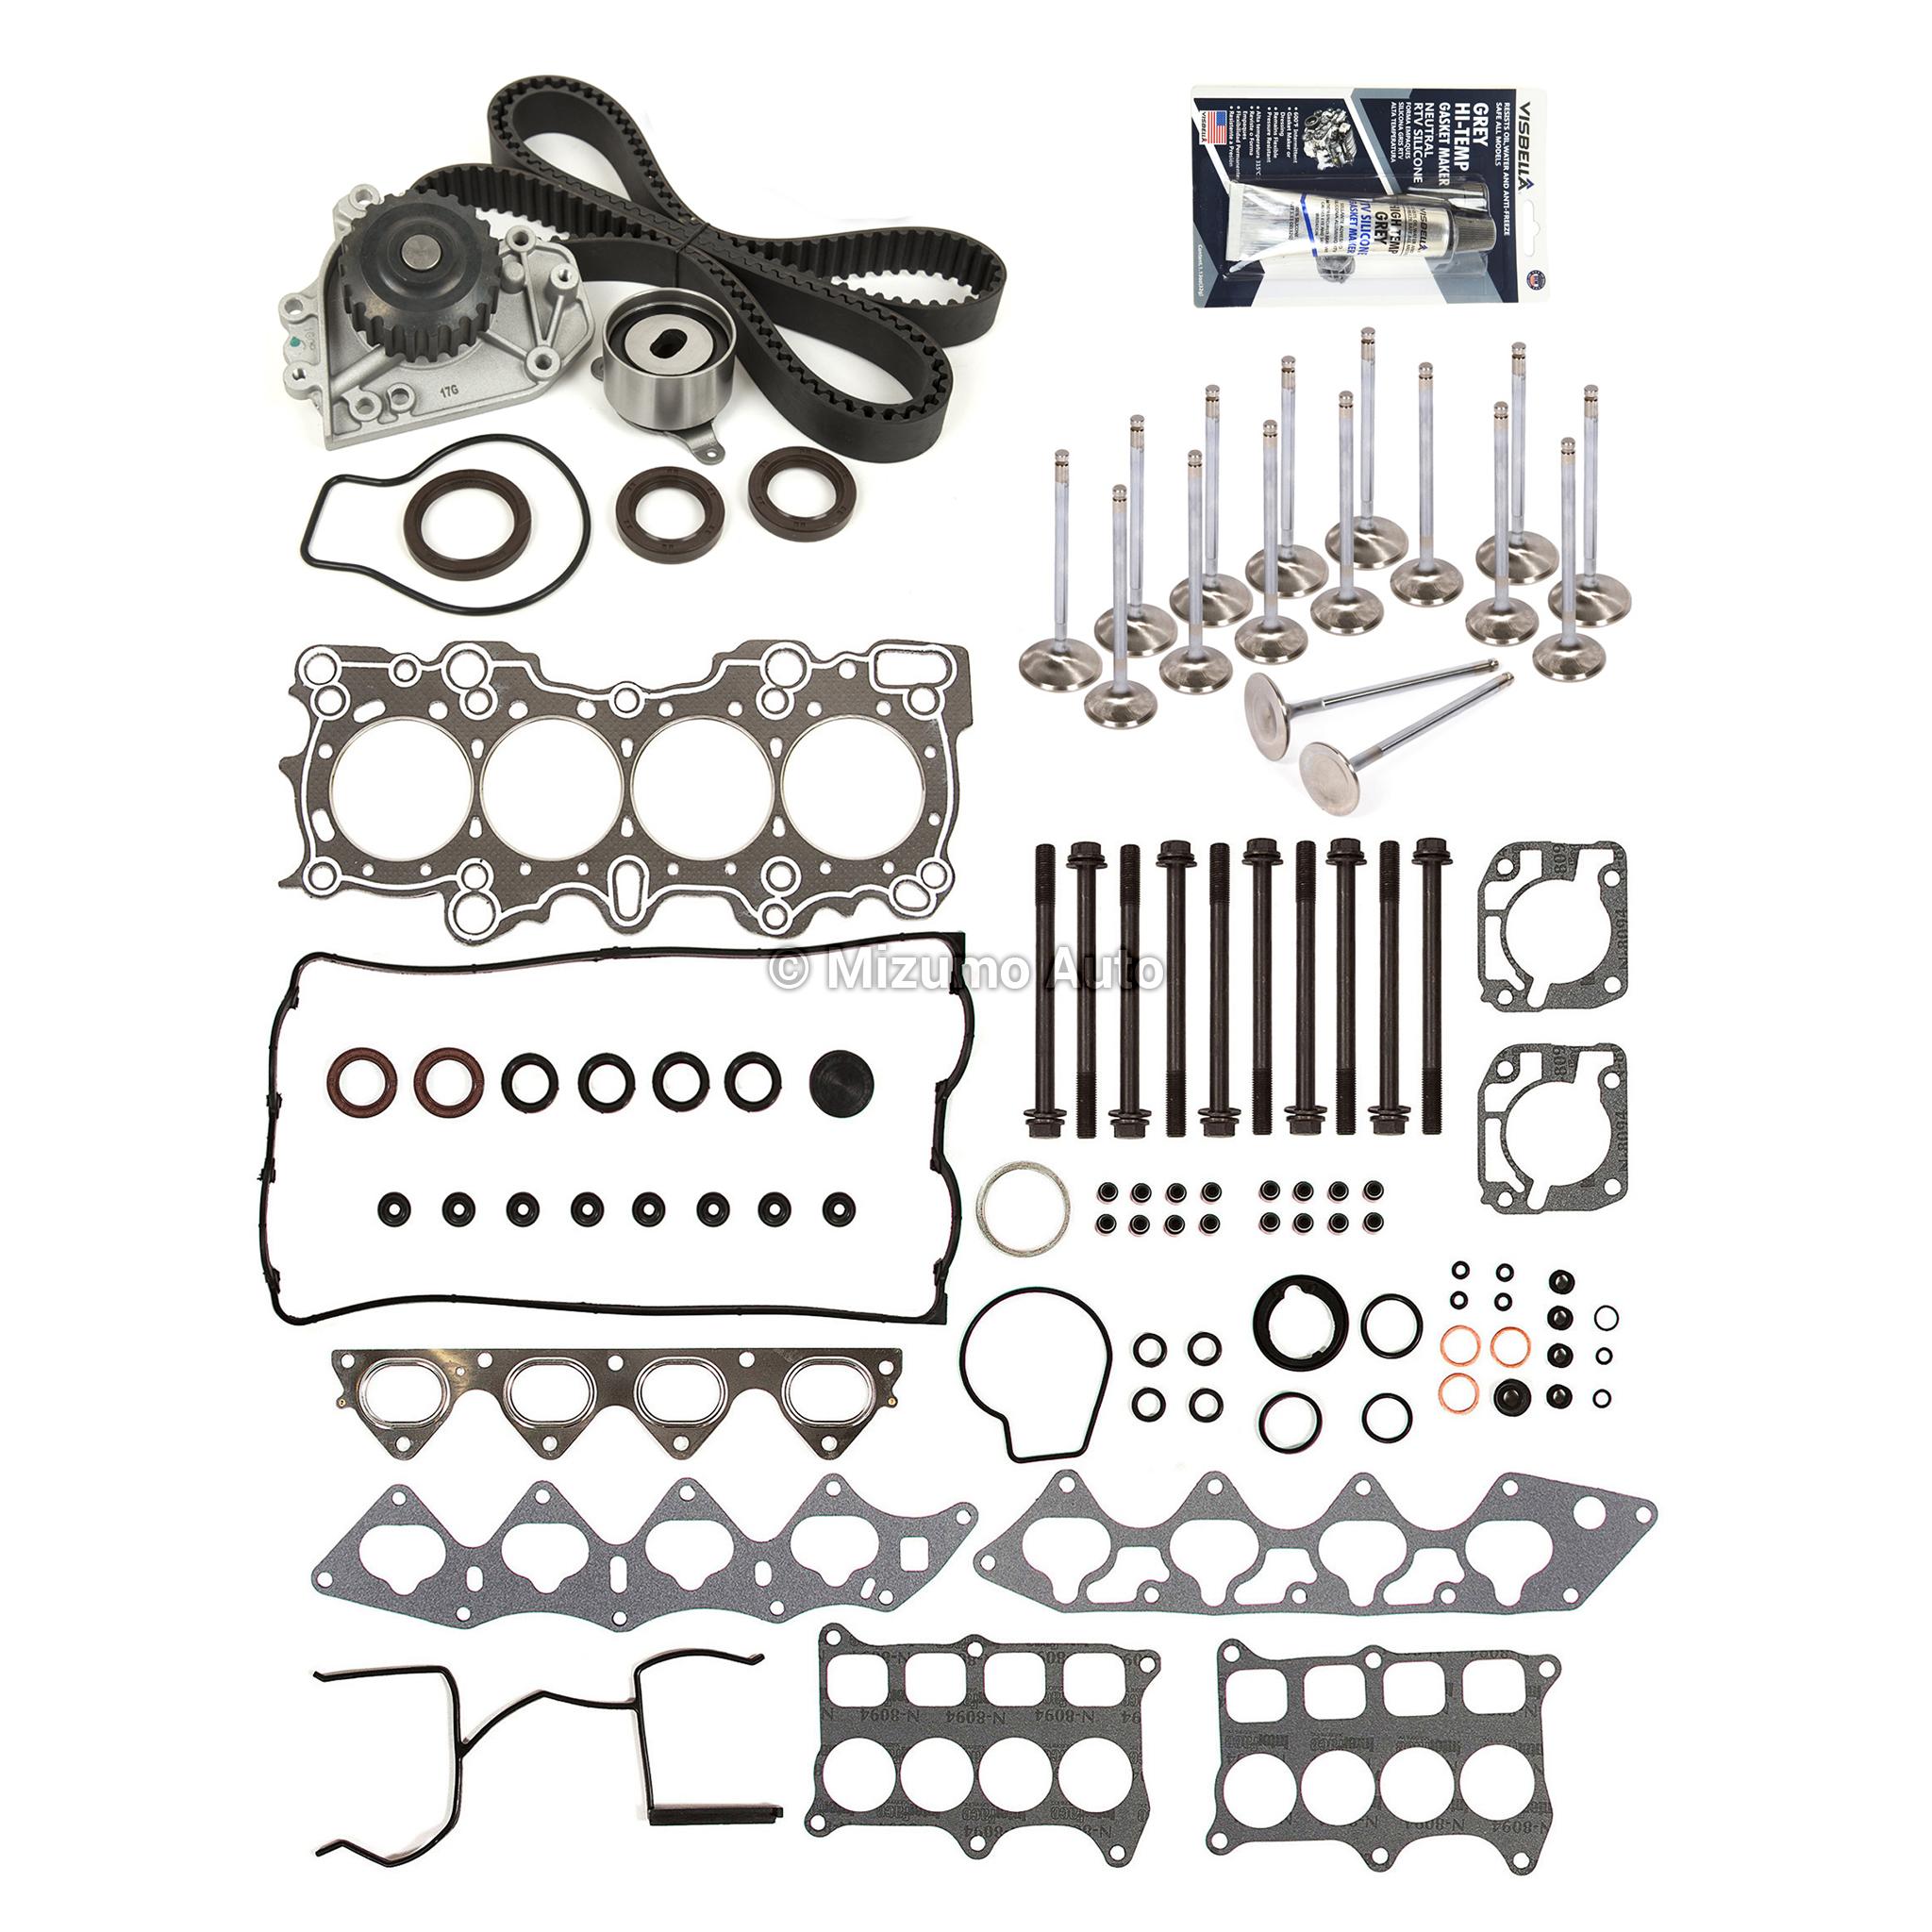 Head Gasket Set Valves Timing Belt Kit Fit 94 01 Acura